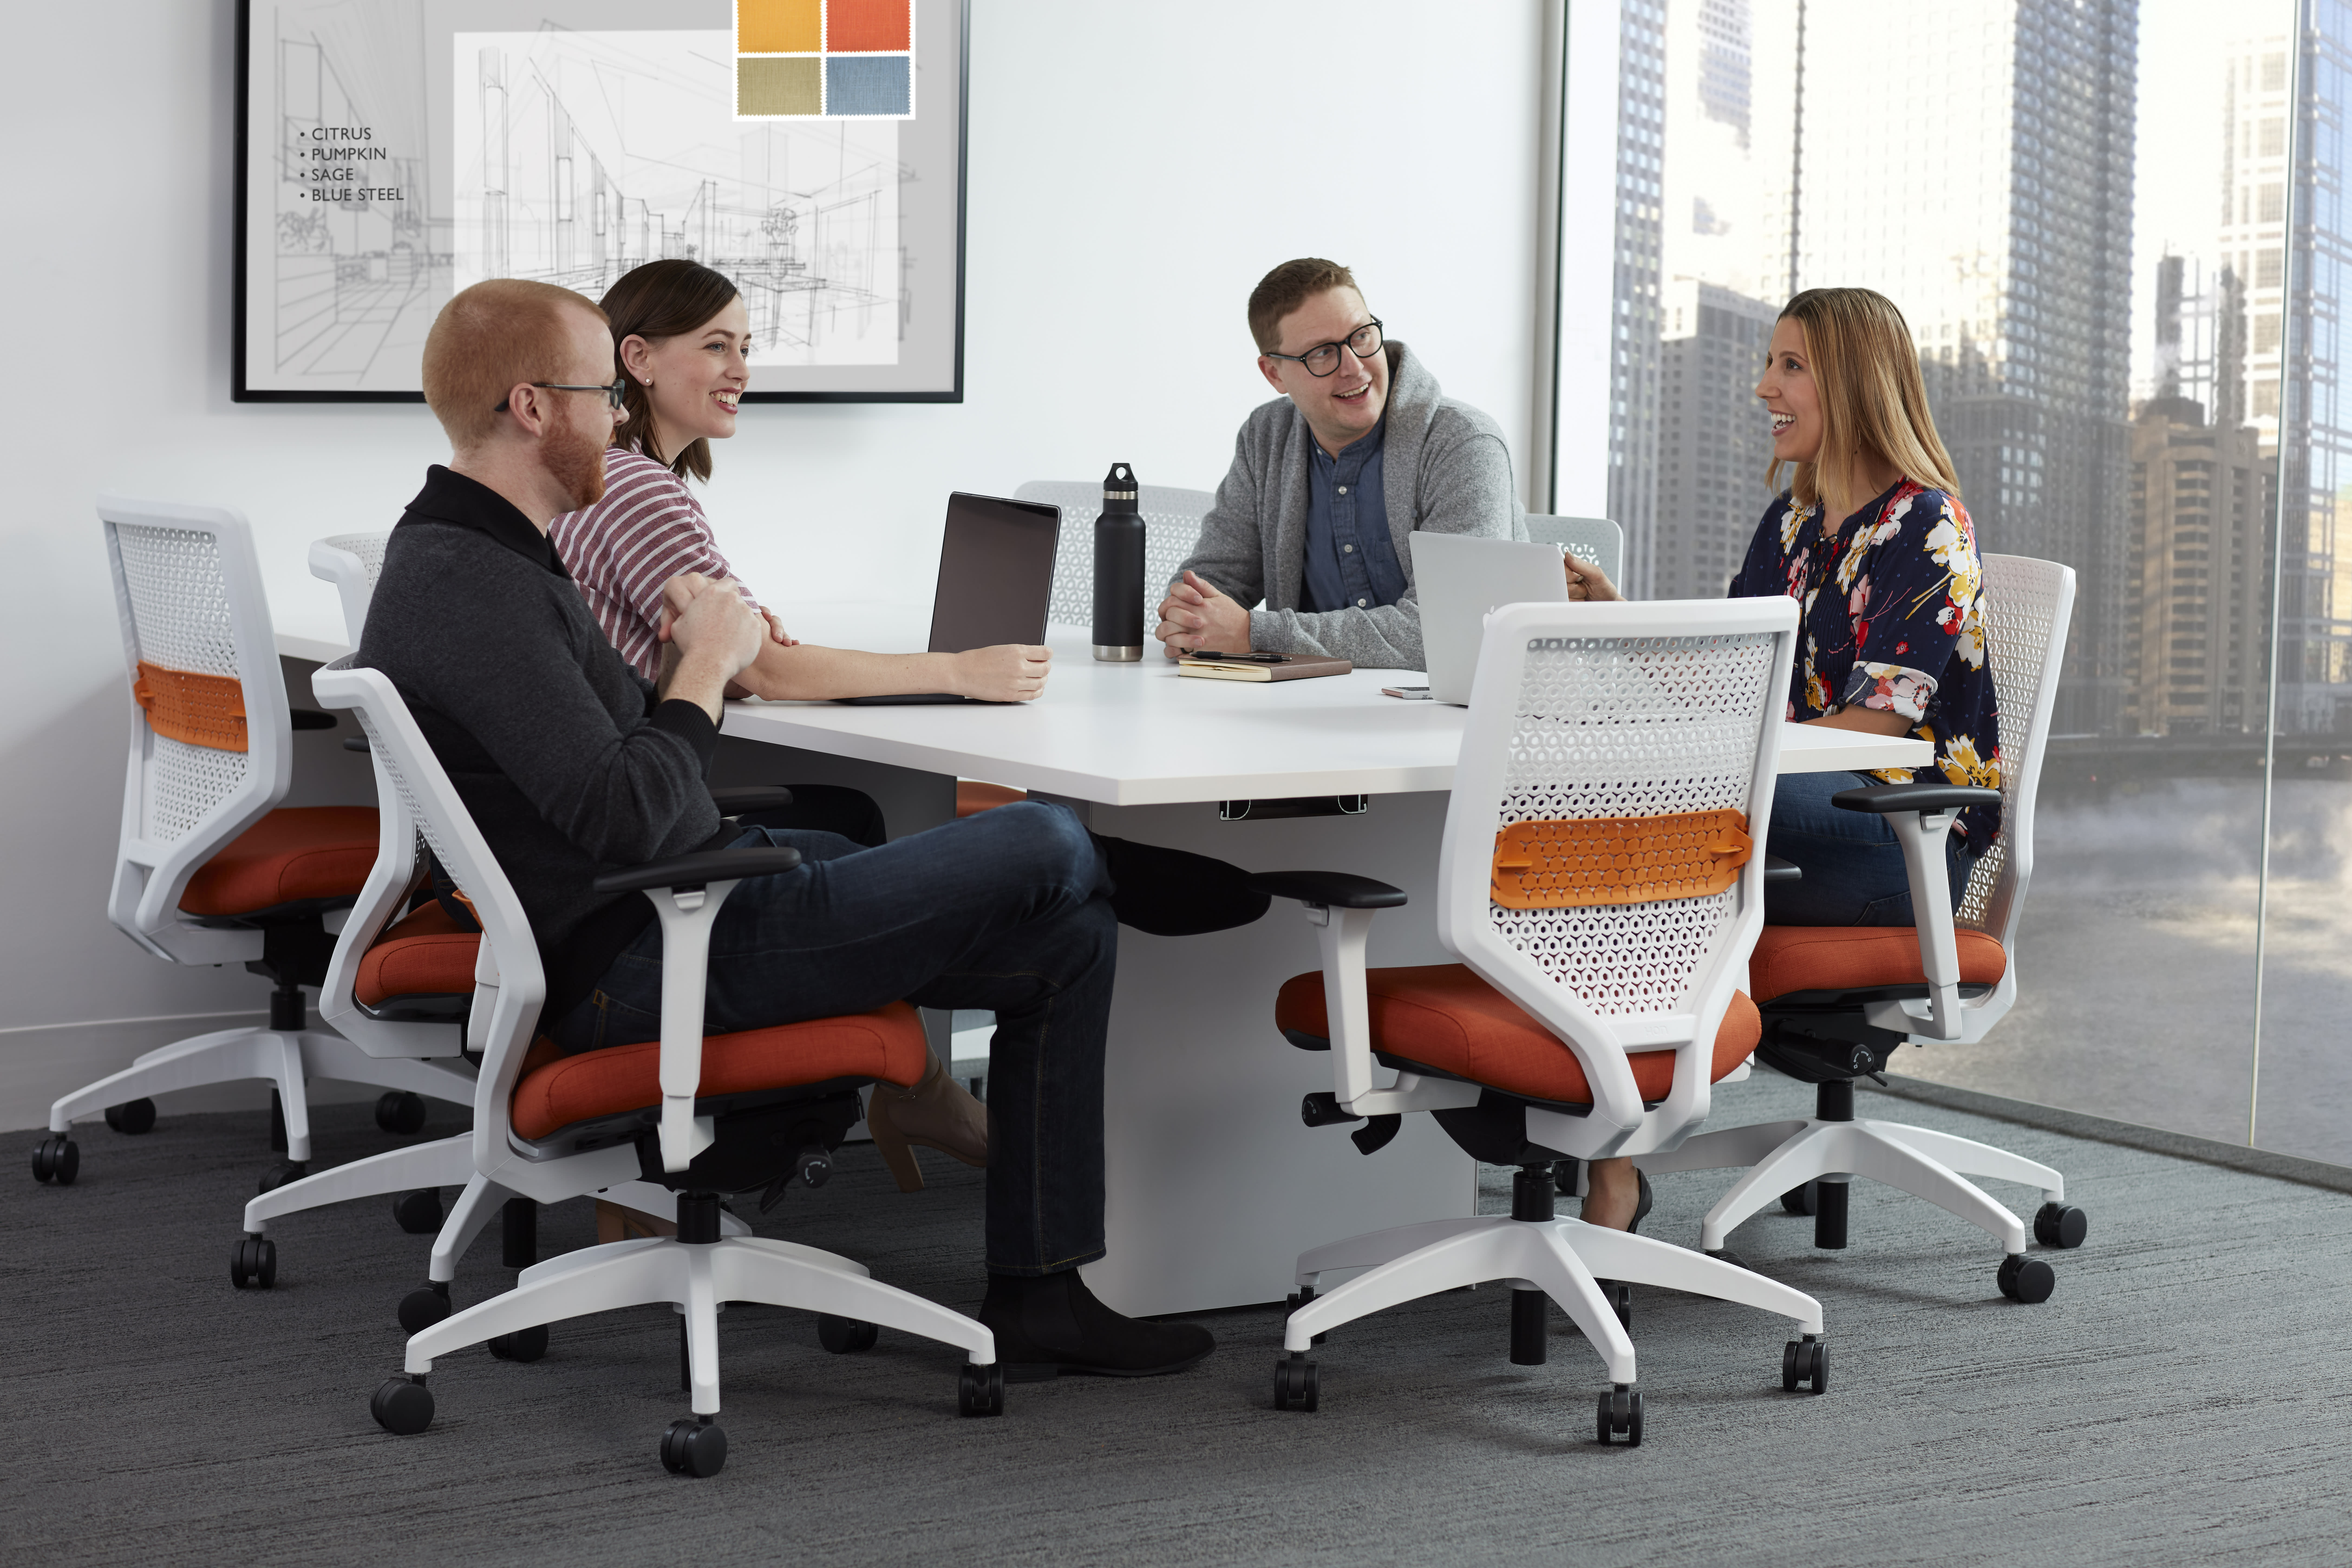 HON/Chairs/Solve/HON-Solve-HSLVTMRS.Y2.ADW.H.DW.COMP46.MR.DW.SB.DW-700-001